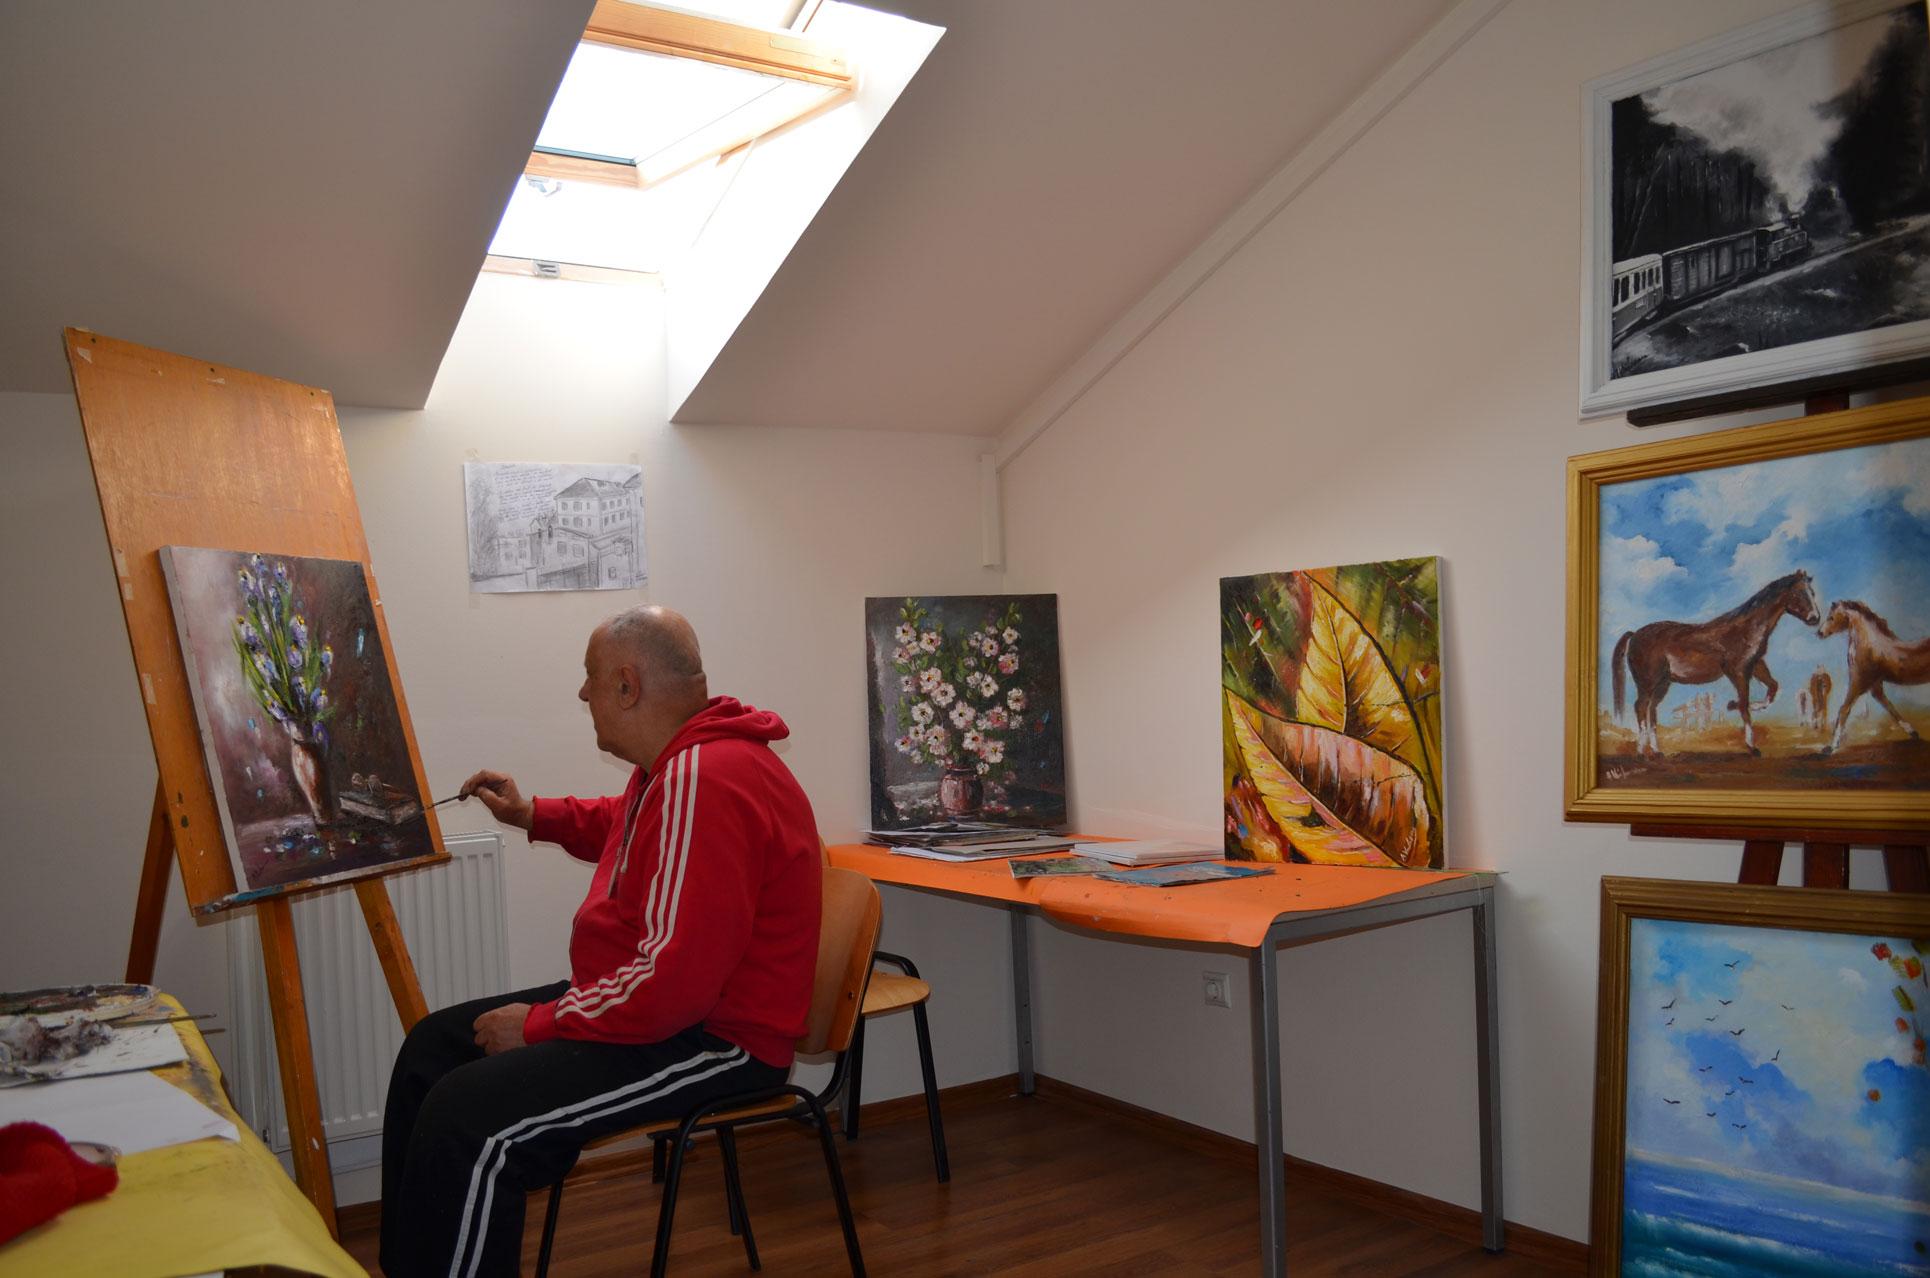 Atelier-de-pictura-penitenciarul-timisoara-grozav